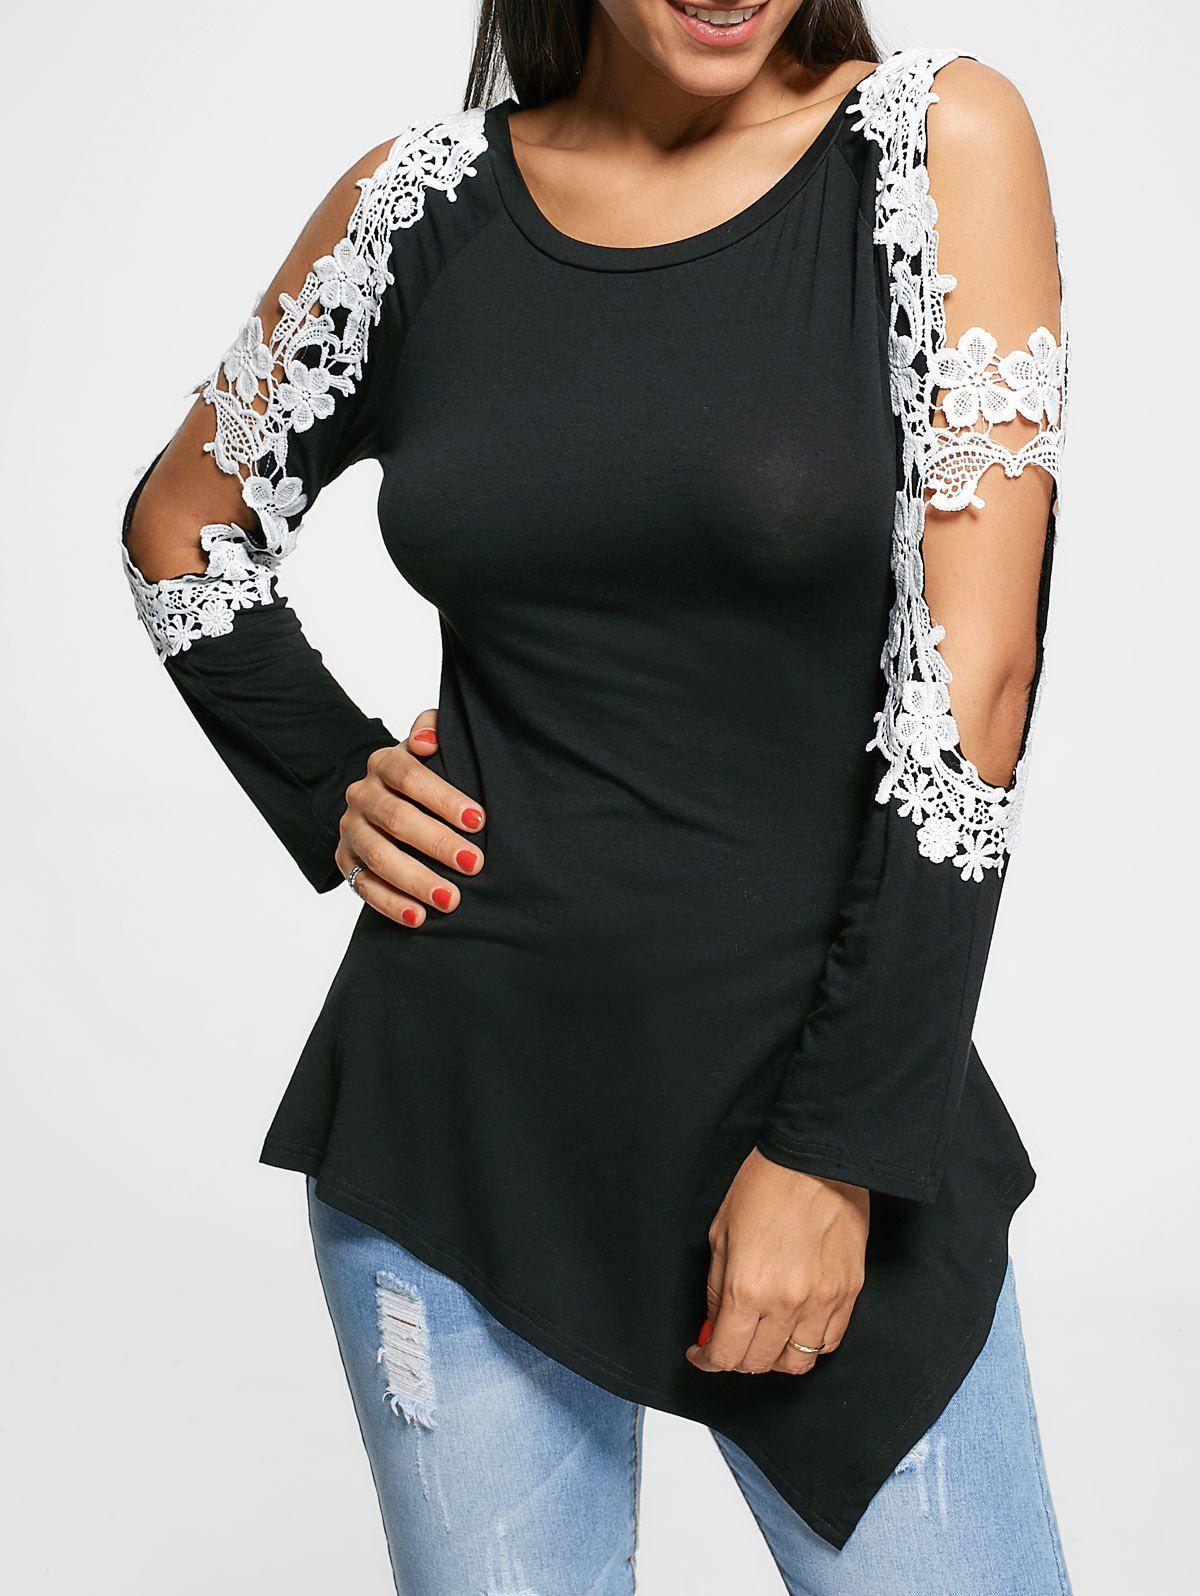 f744b2077f58a0 Long Sleeve Floral Applique Cut Out Top - Black - 2xl